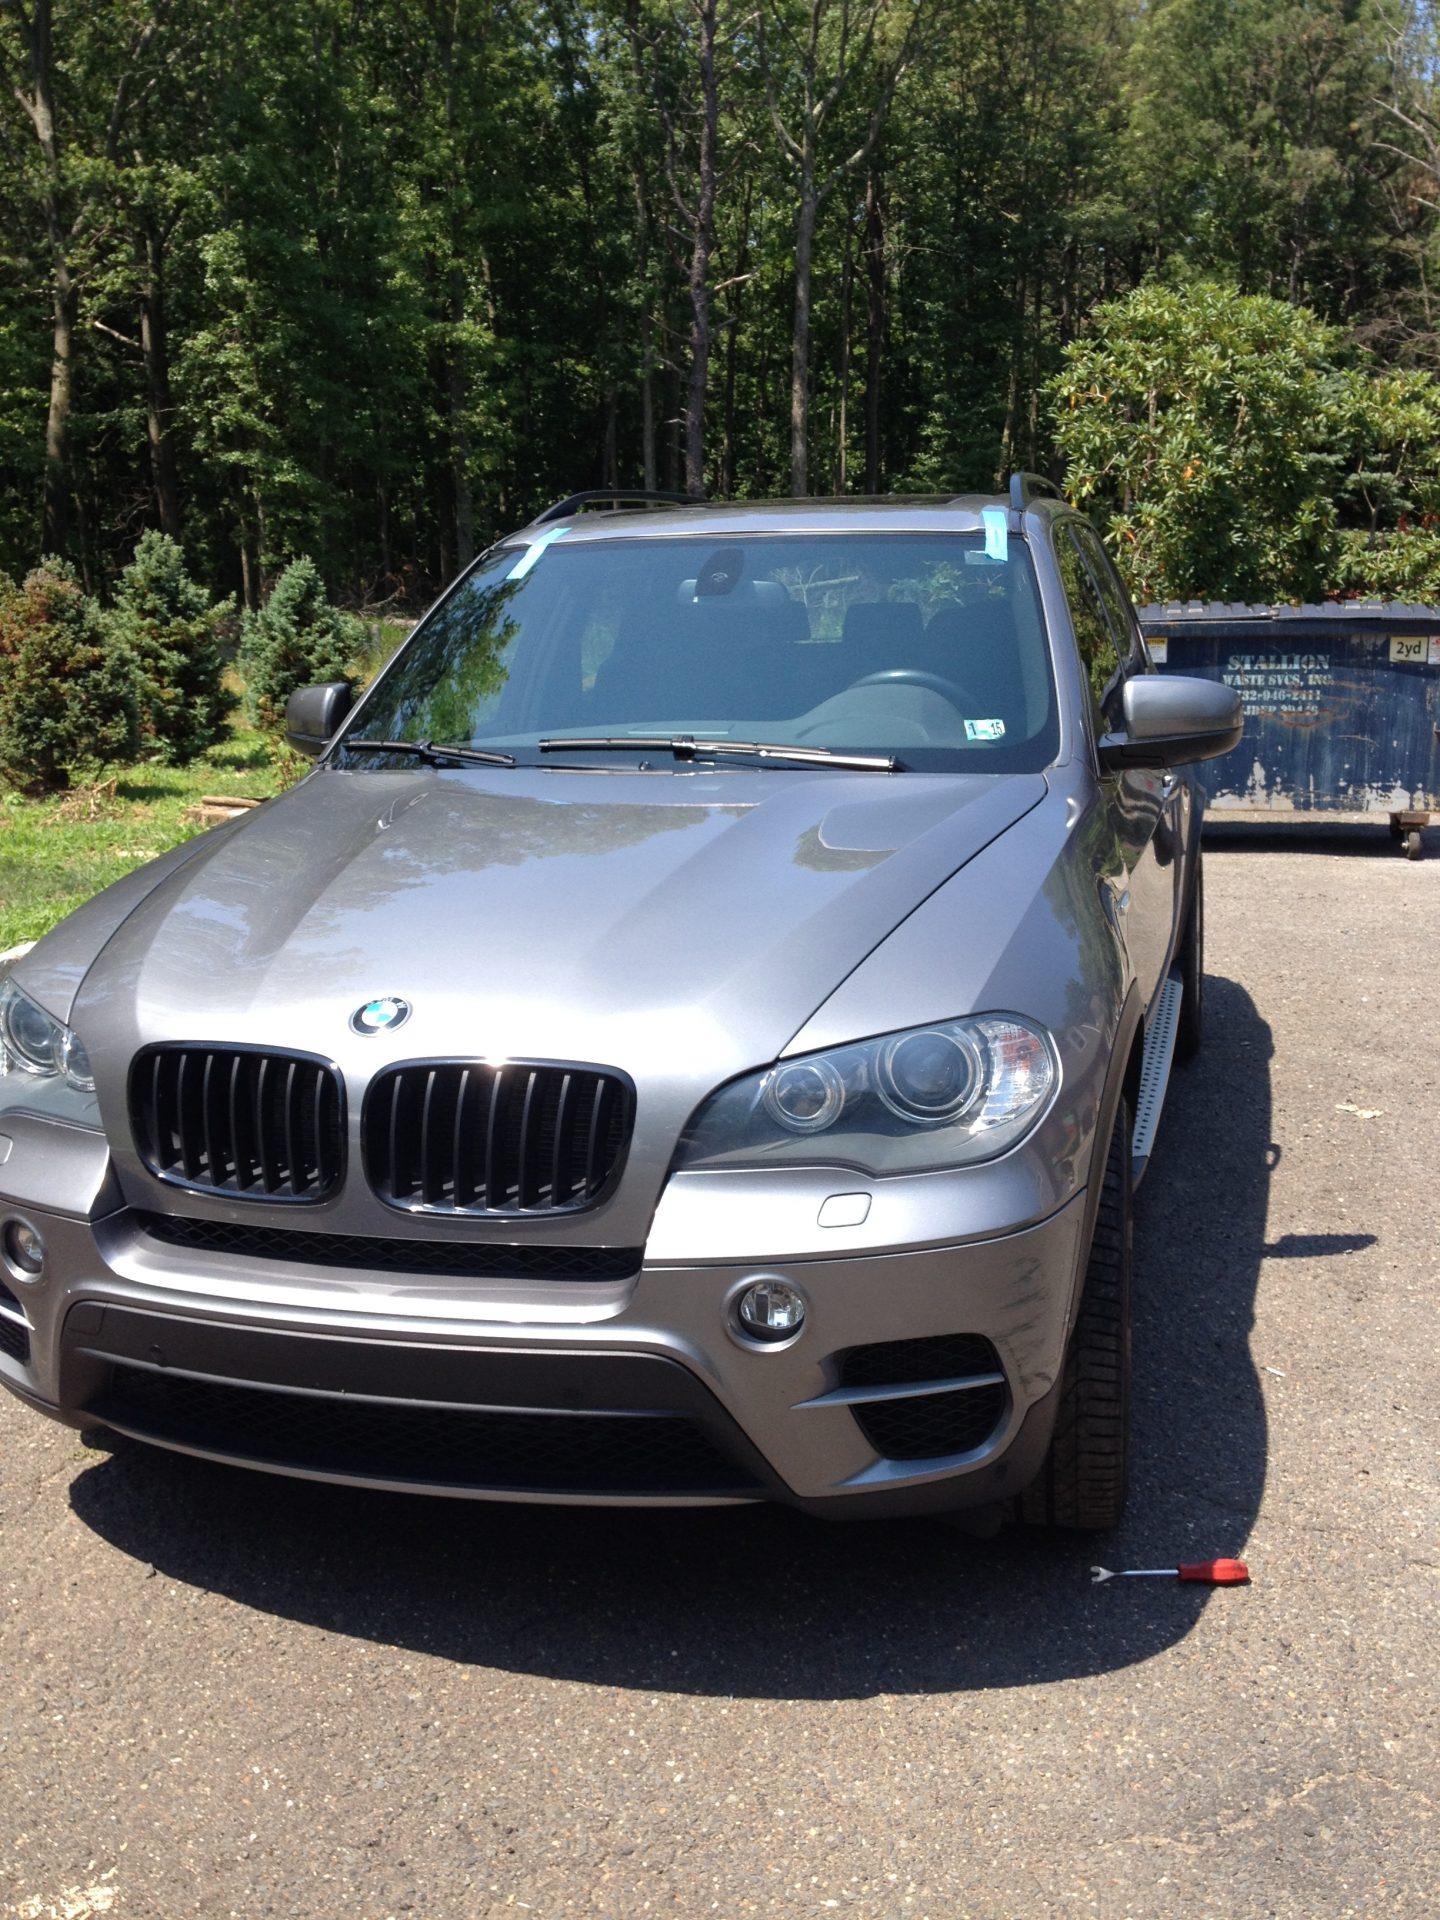 BMW X5 windshield installation After by Platinum Auto Linden Glass New Jersey